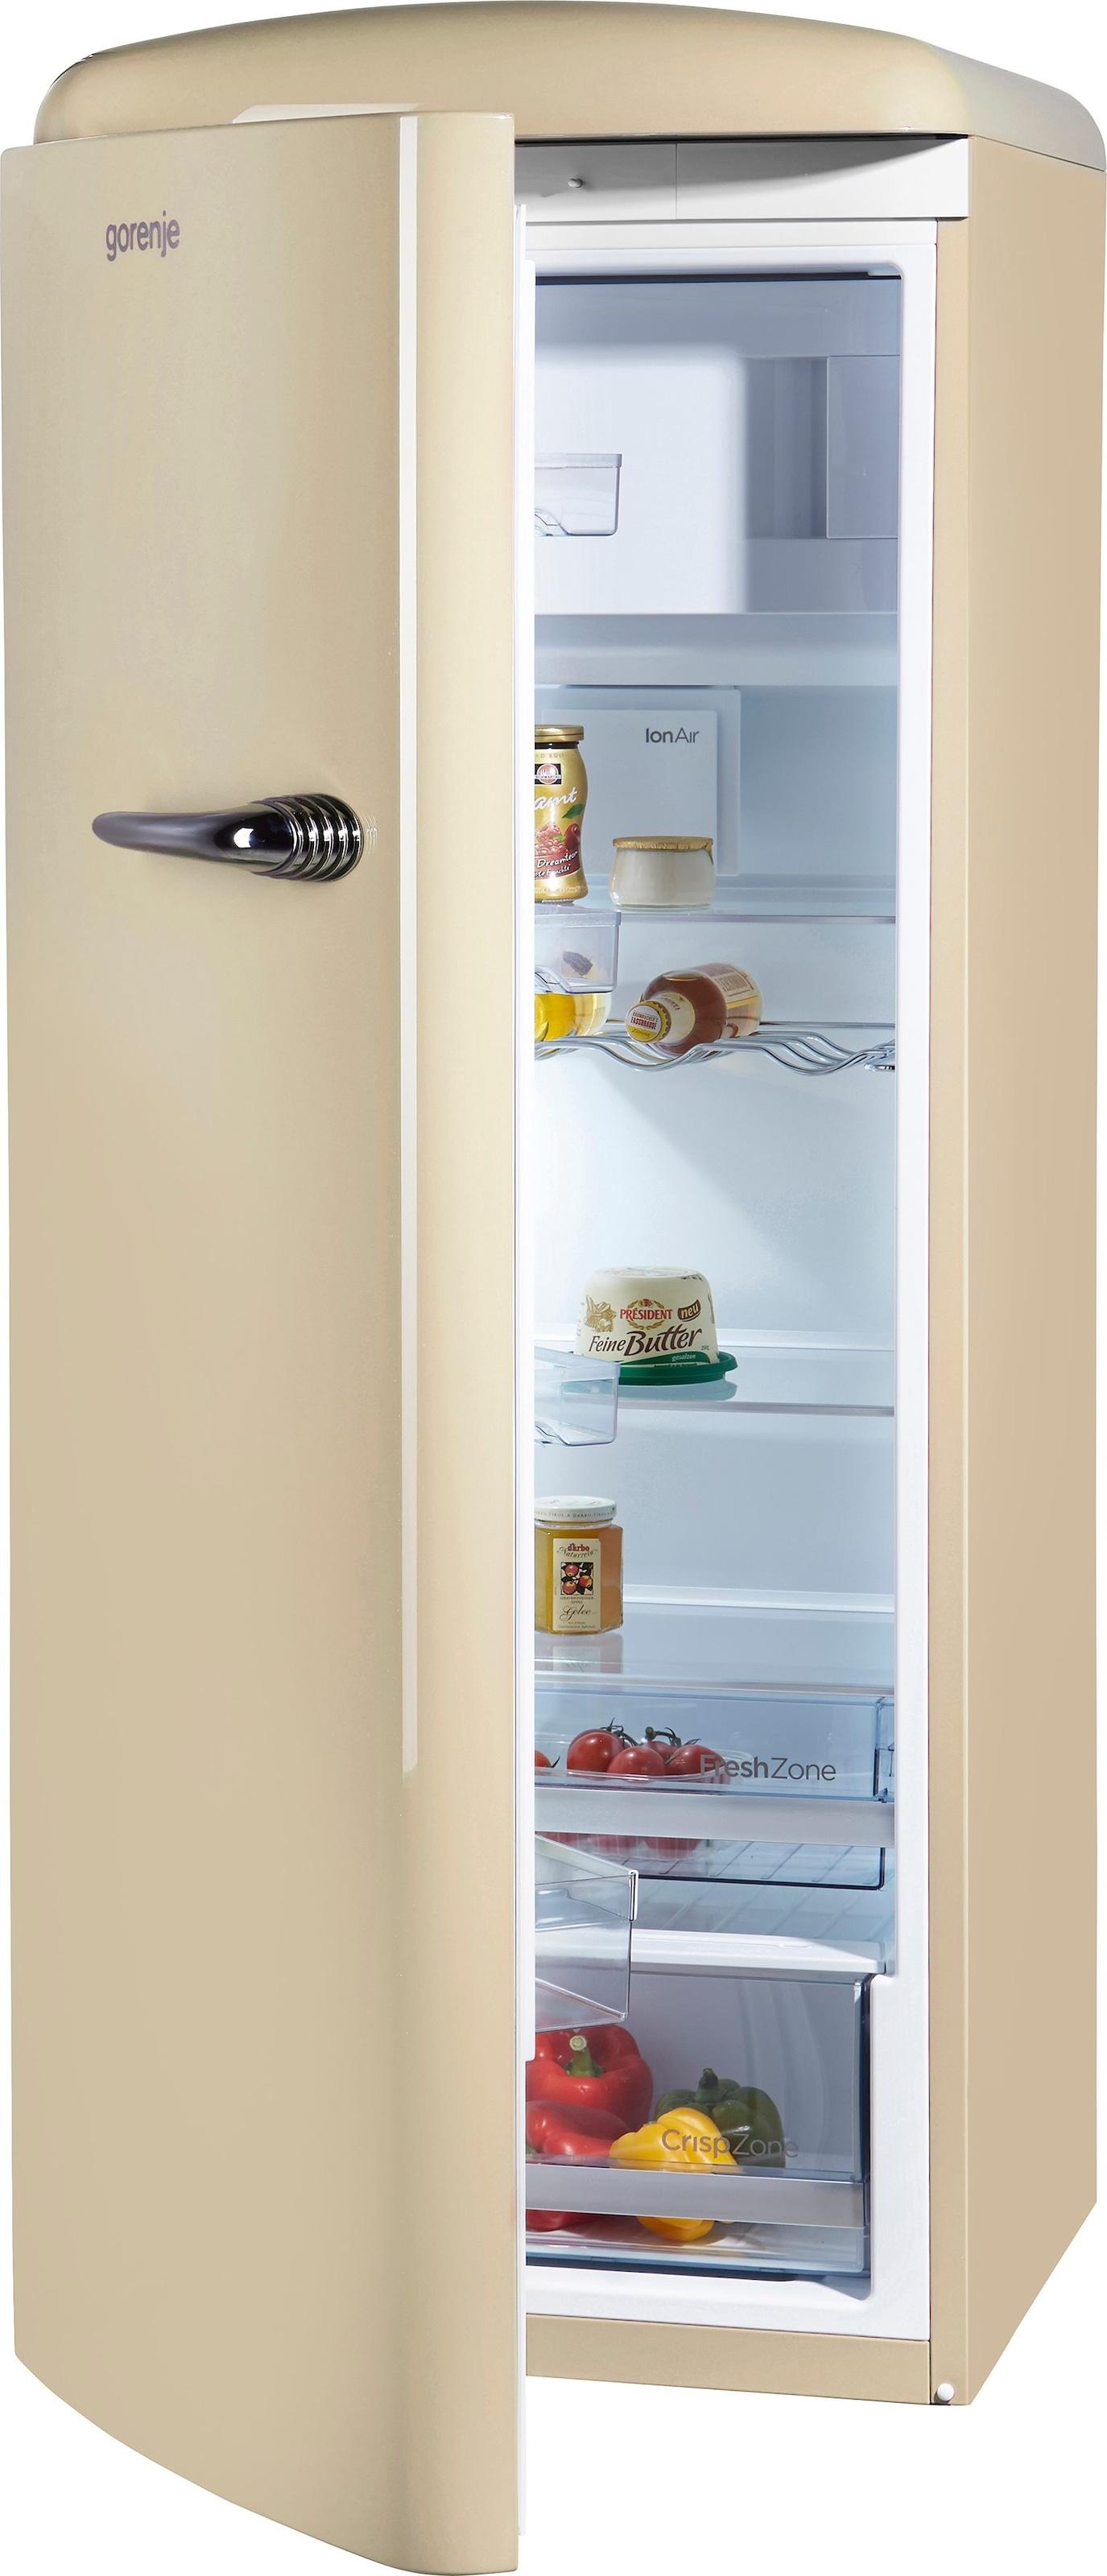 Gorenje Kühlschrank Vw Kaufen : Gorenje kühlschrank retro vw gorenje retro in hessen ebay